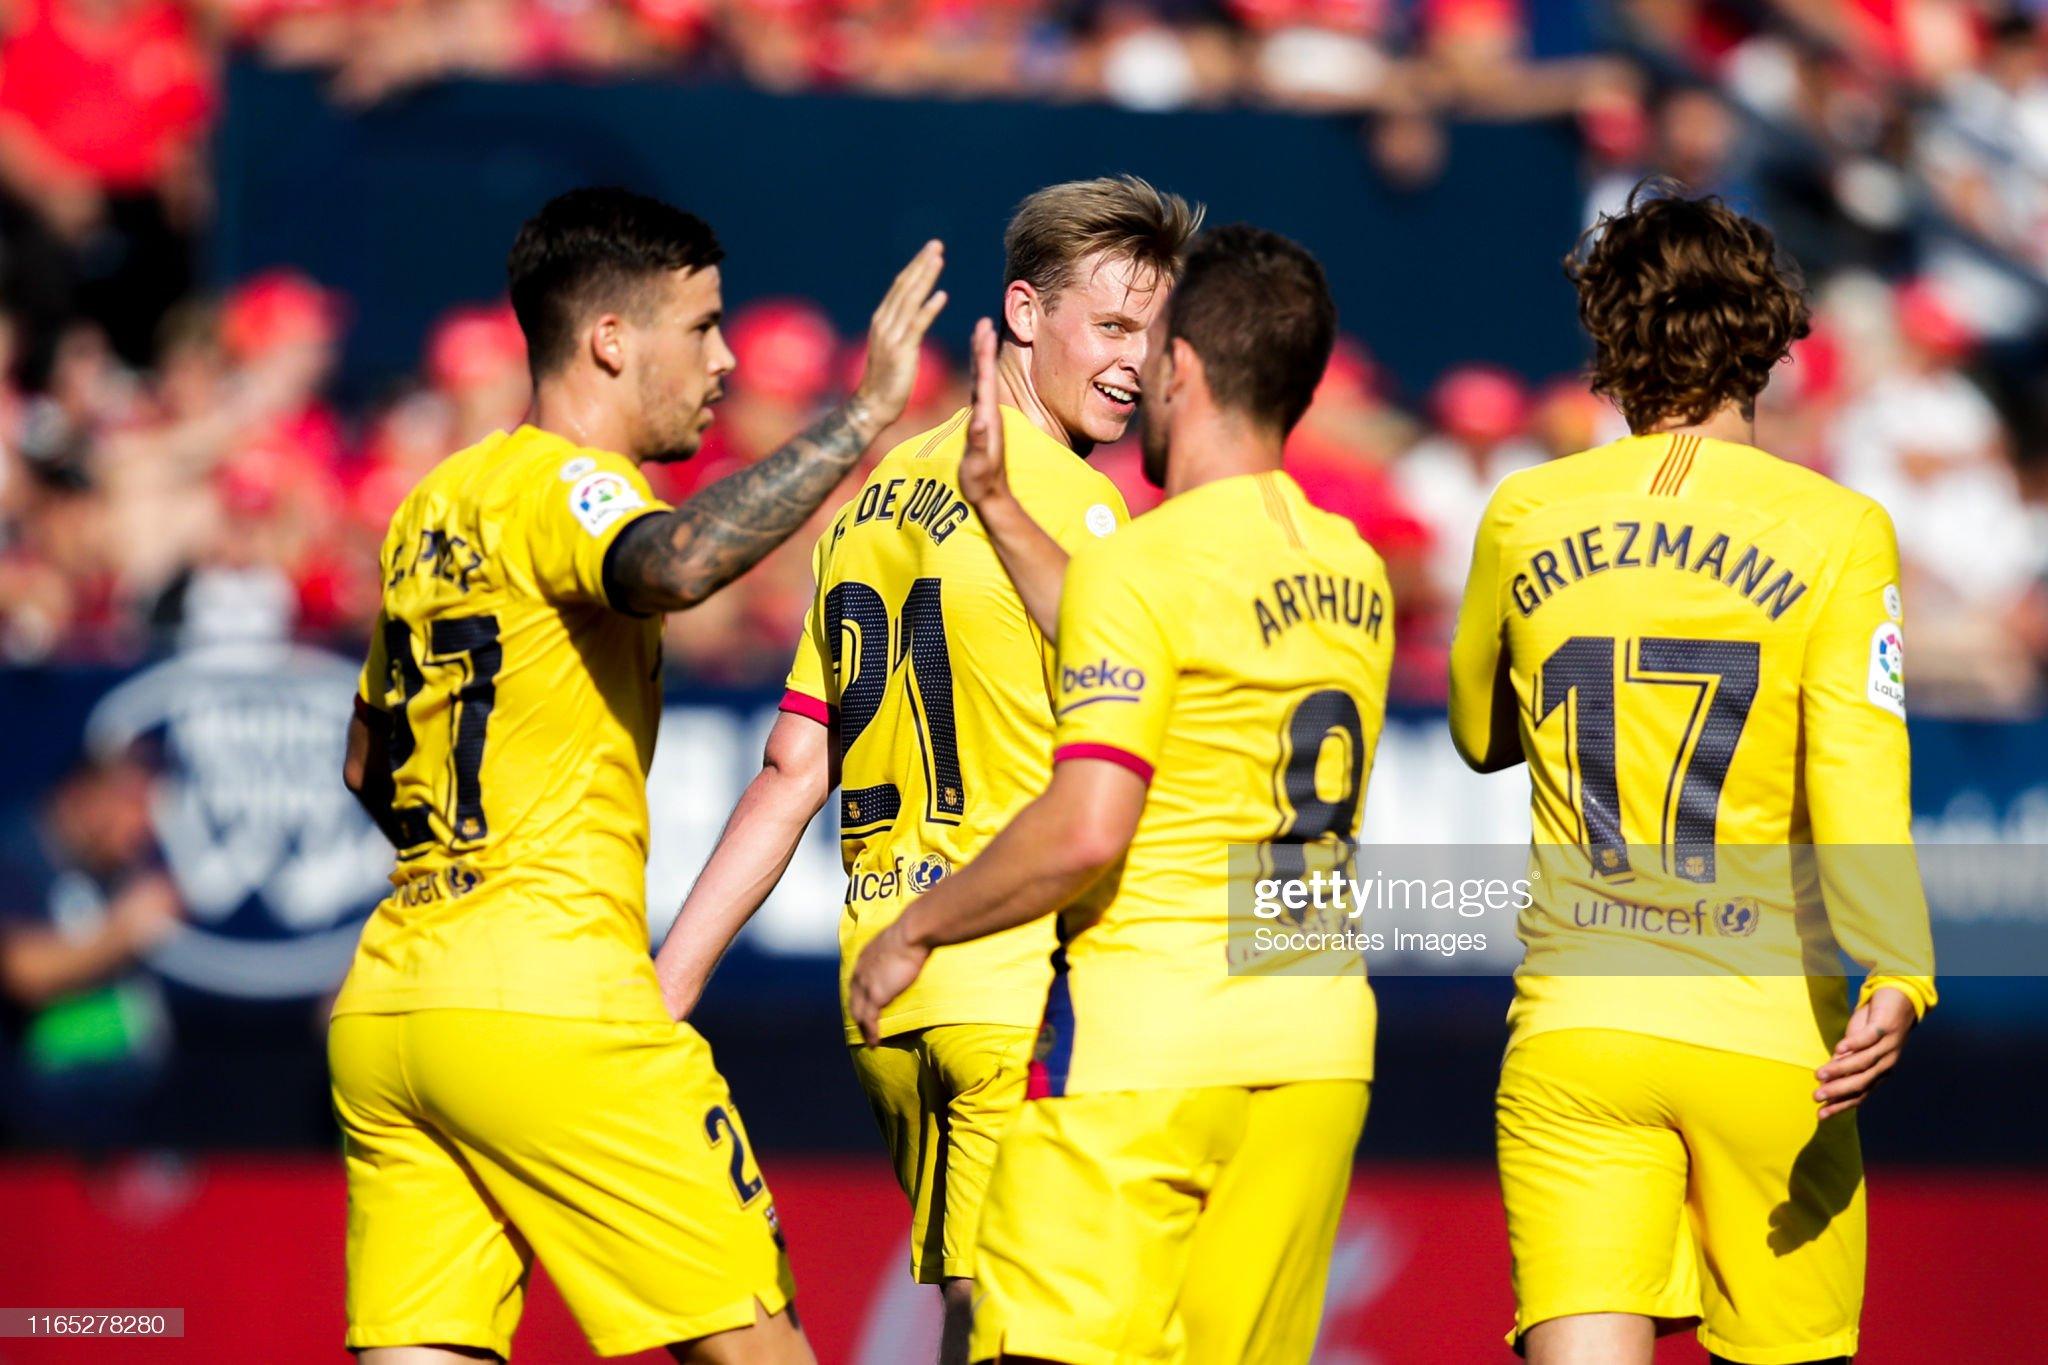 صور مباراة : أوساسونا - برشلونة 2-2 ( 31-08-2019 )  Ansu-fati-of-fc-barcelona-sergio-busquets-of-fc-barcelona-jordi-alba-picture-id1165278280?s=2048x2048